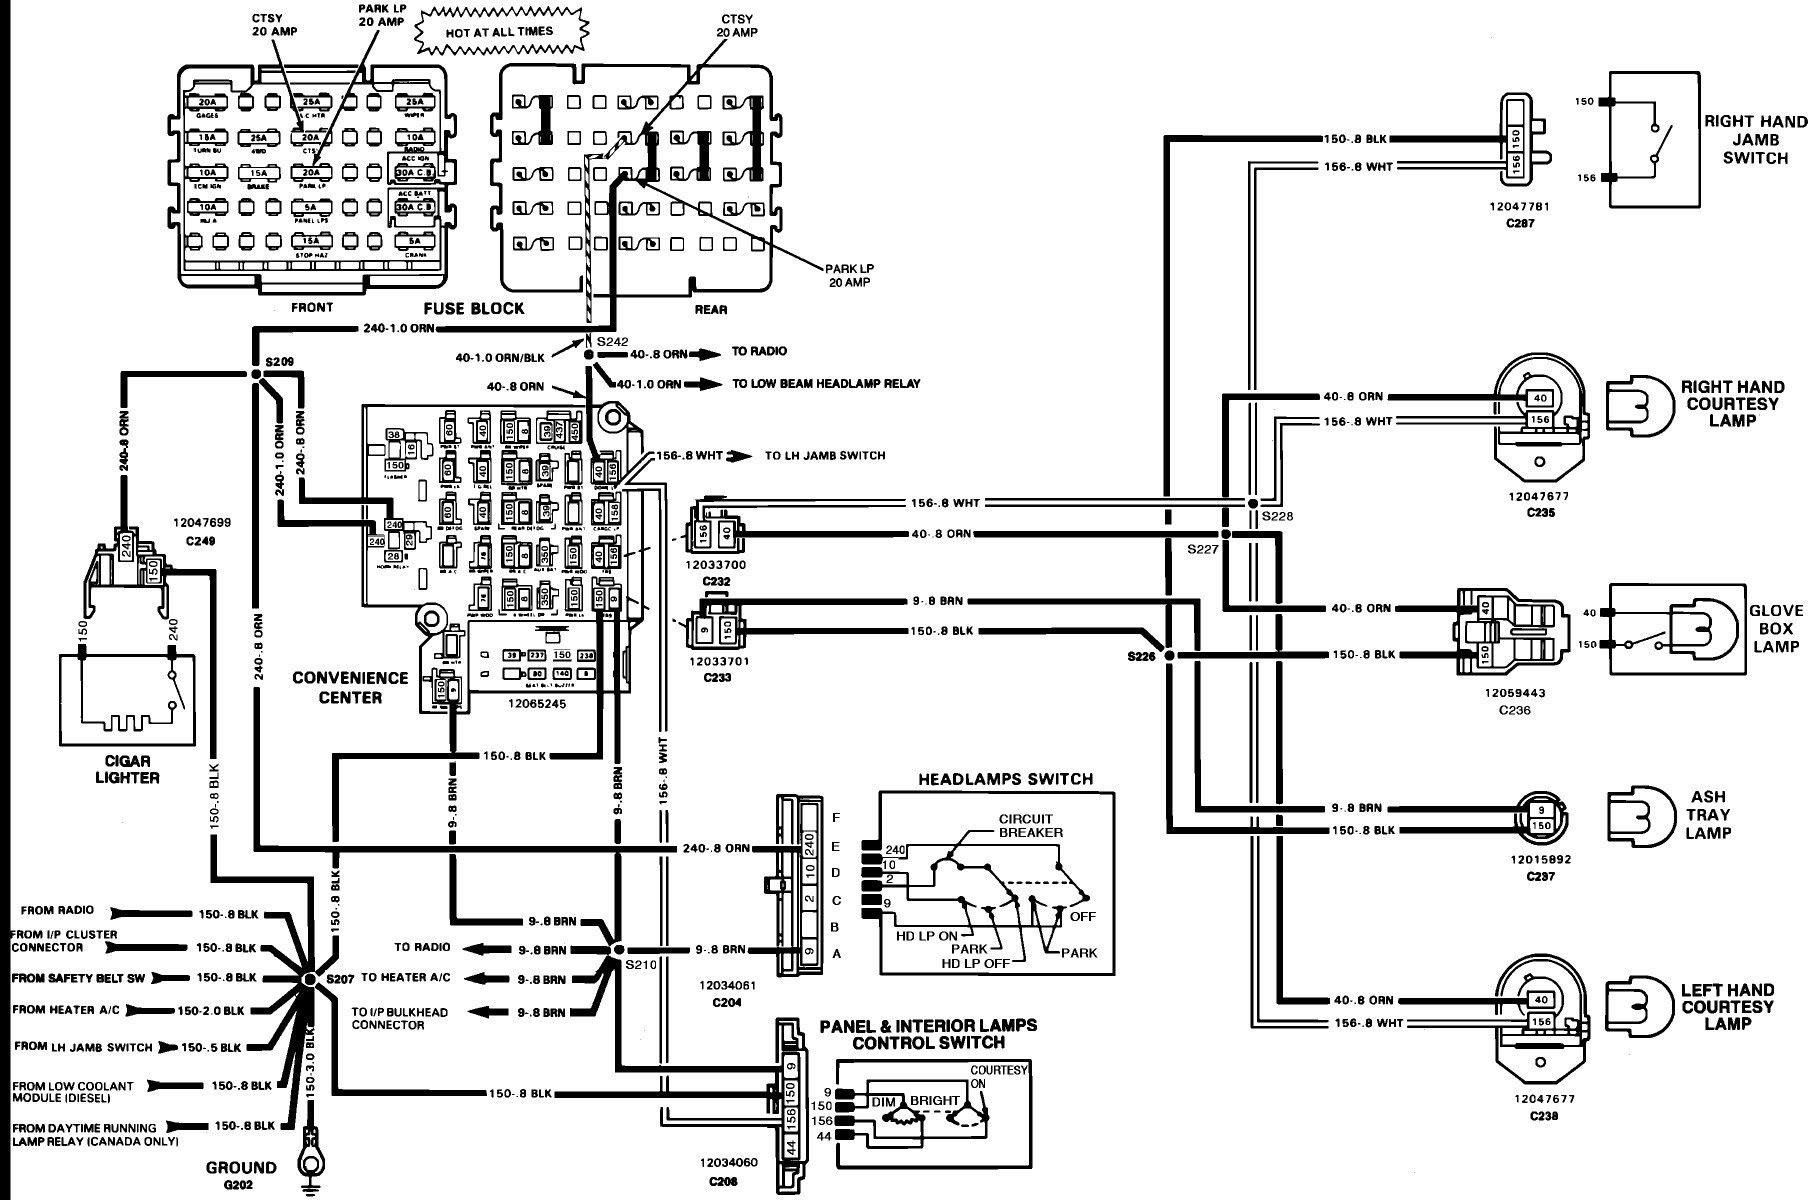 Luxury Wiring Diagram Of An Alternator Diagrams Digramssample Diagramimages Wiringdiagramsample Wiringdiagram Electrical Diagram Chevy Trucks Diagram